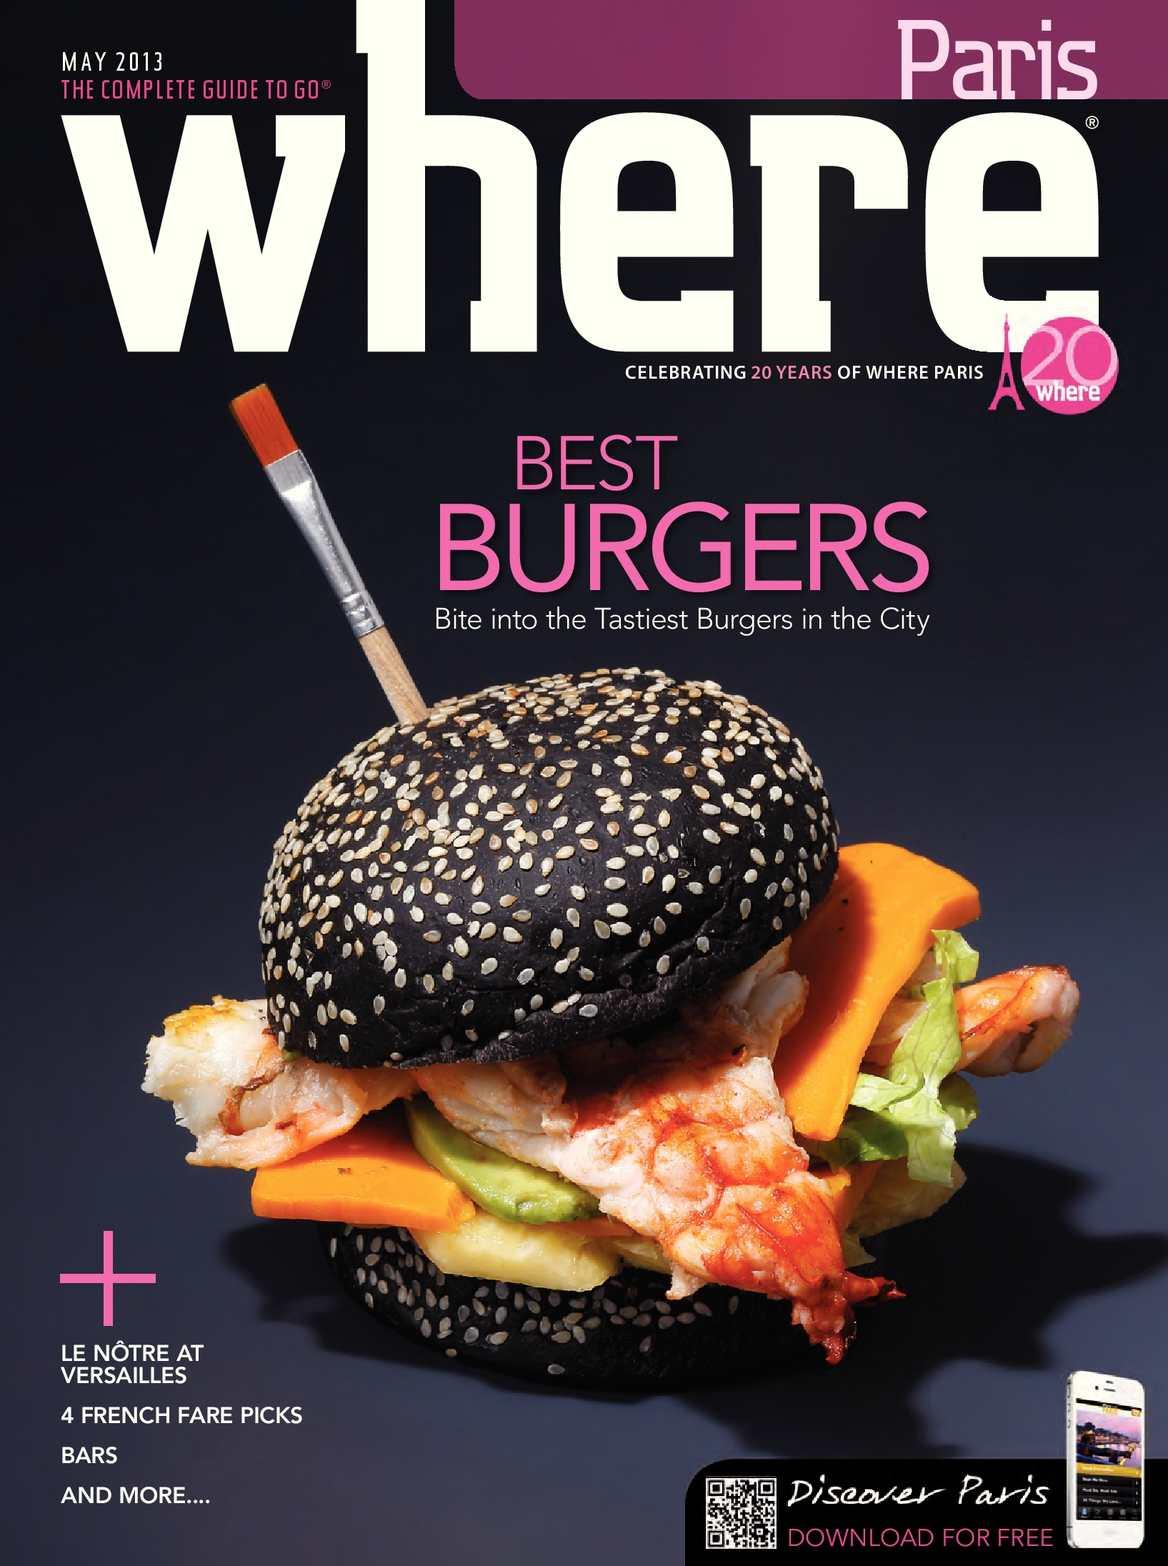 64c27780f17 Calaméo - Where Paris Magazine - May 2013